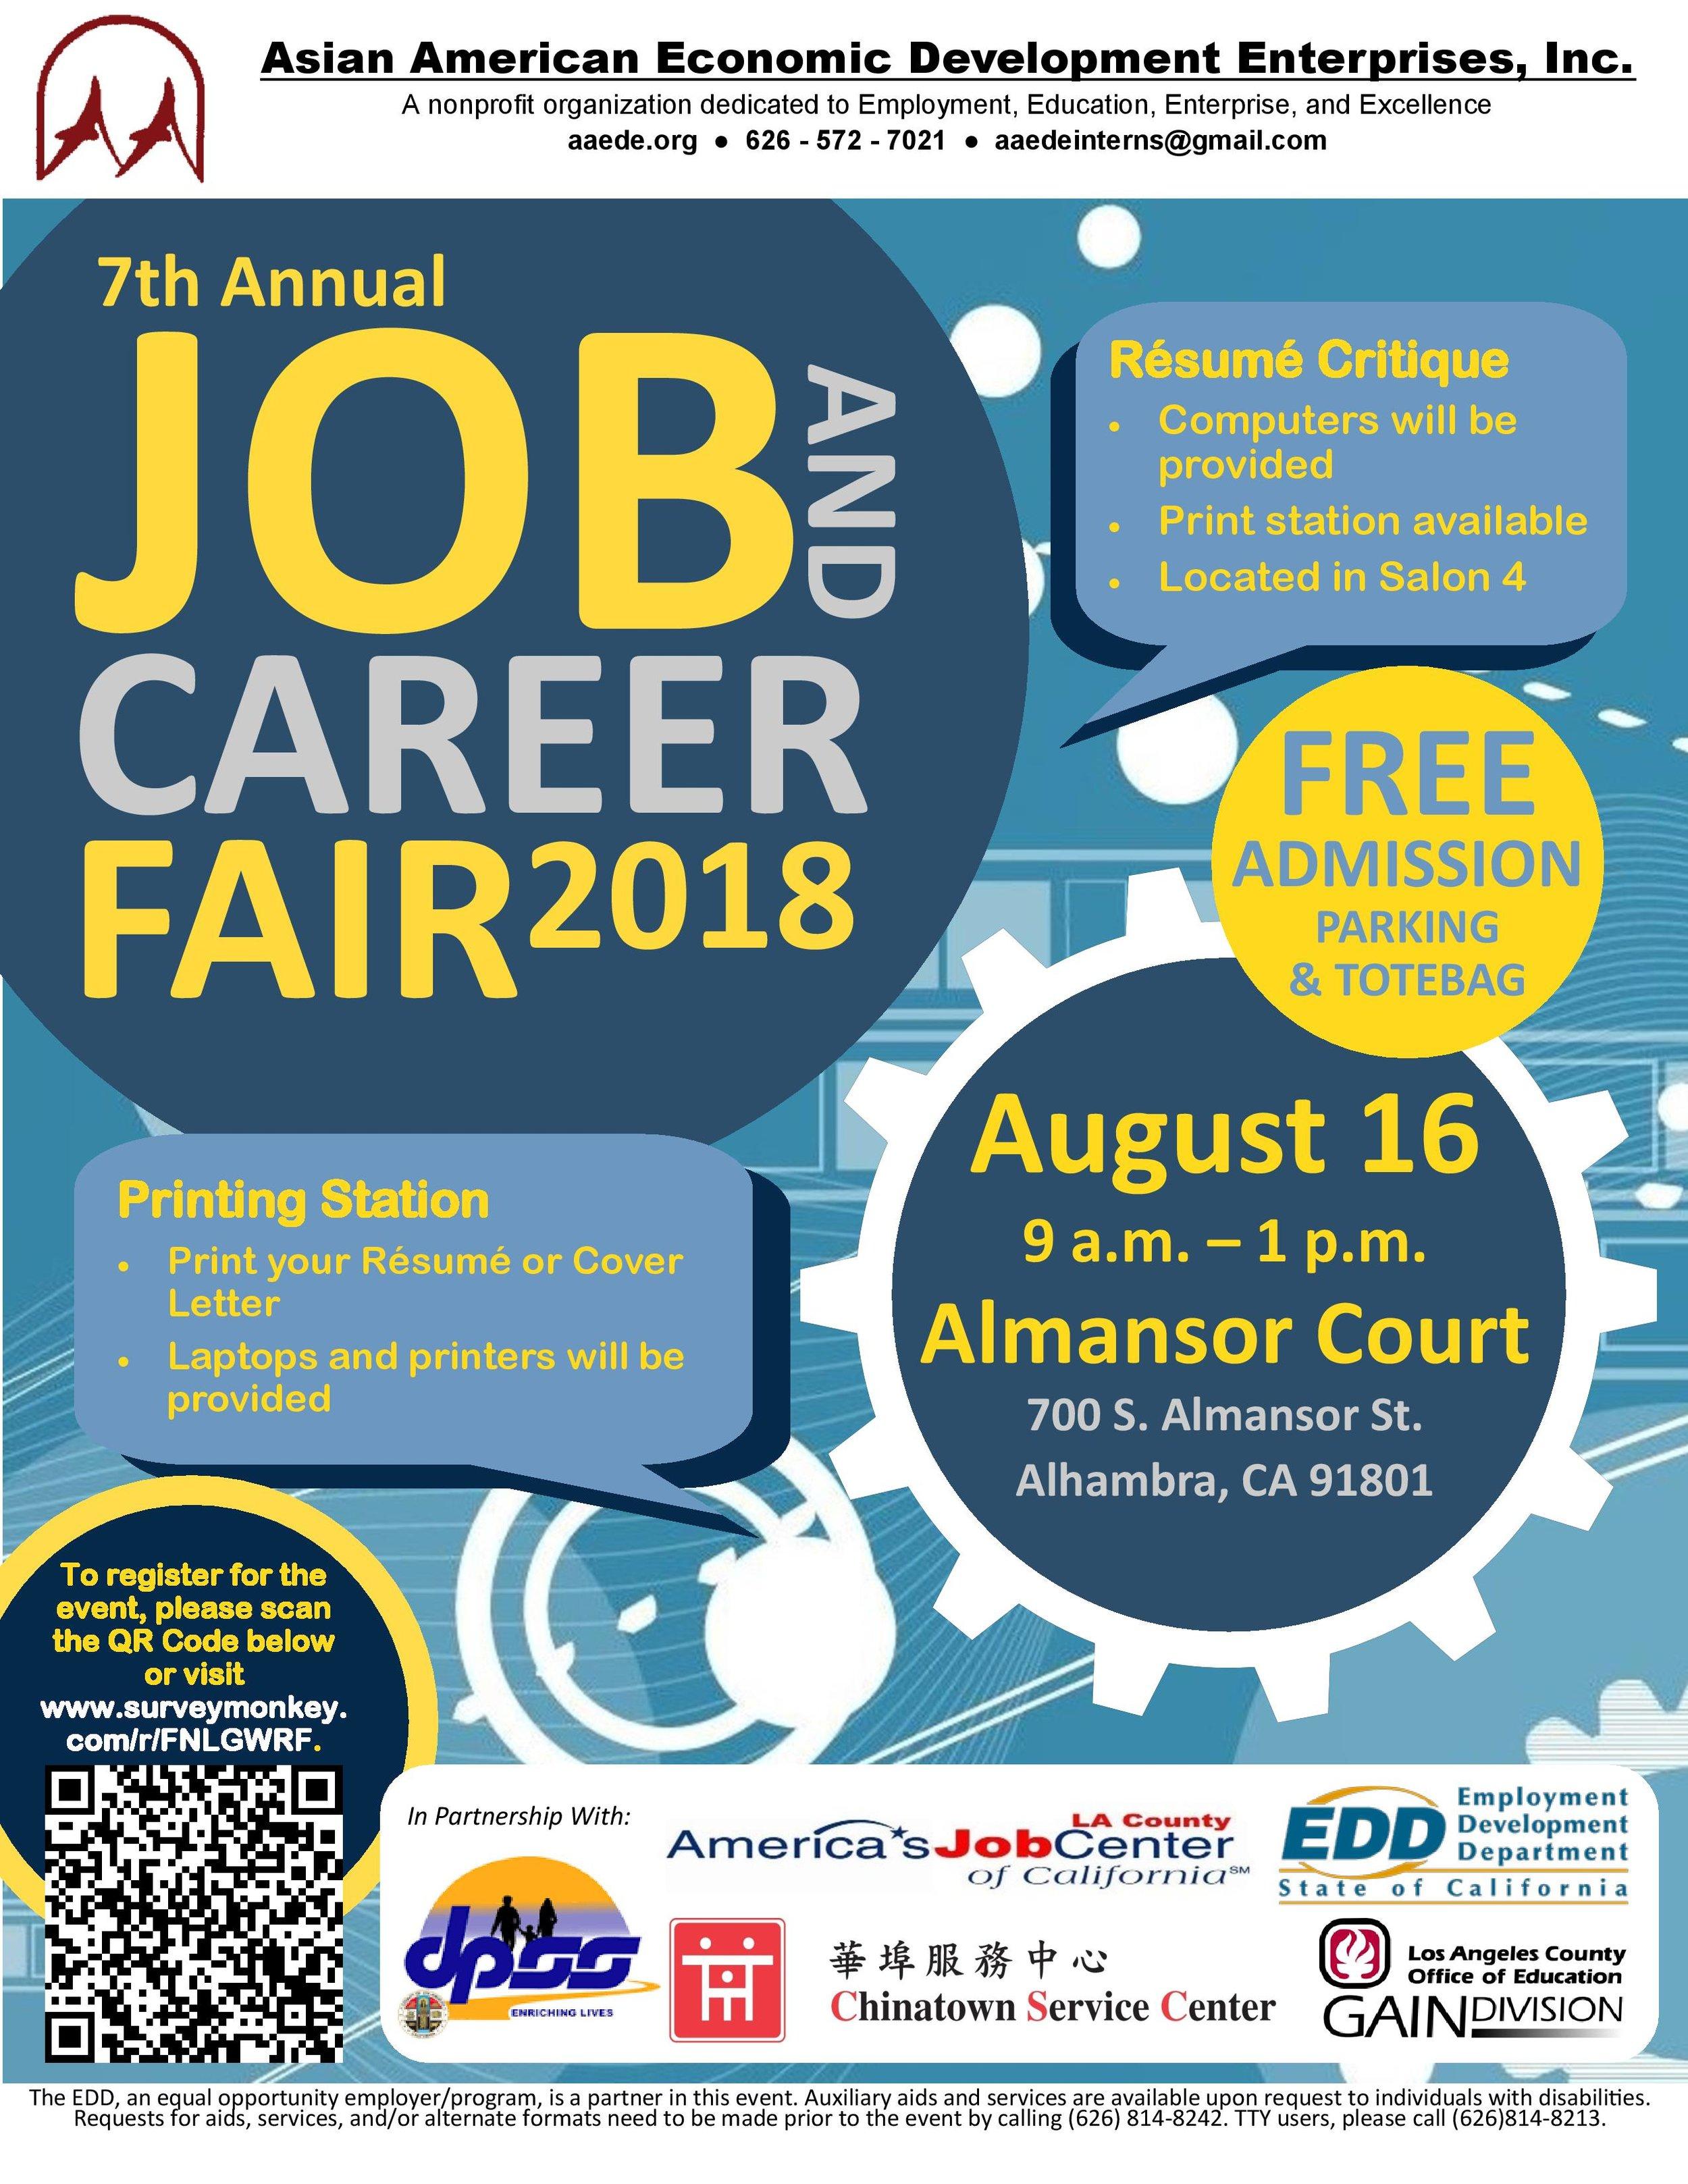 7th annual job and career fair 2018 - August 16th, 2018